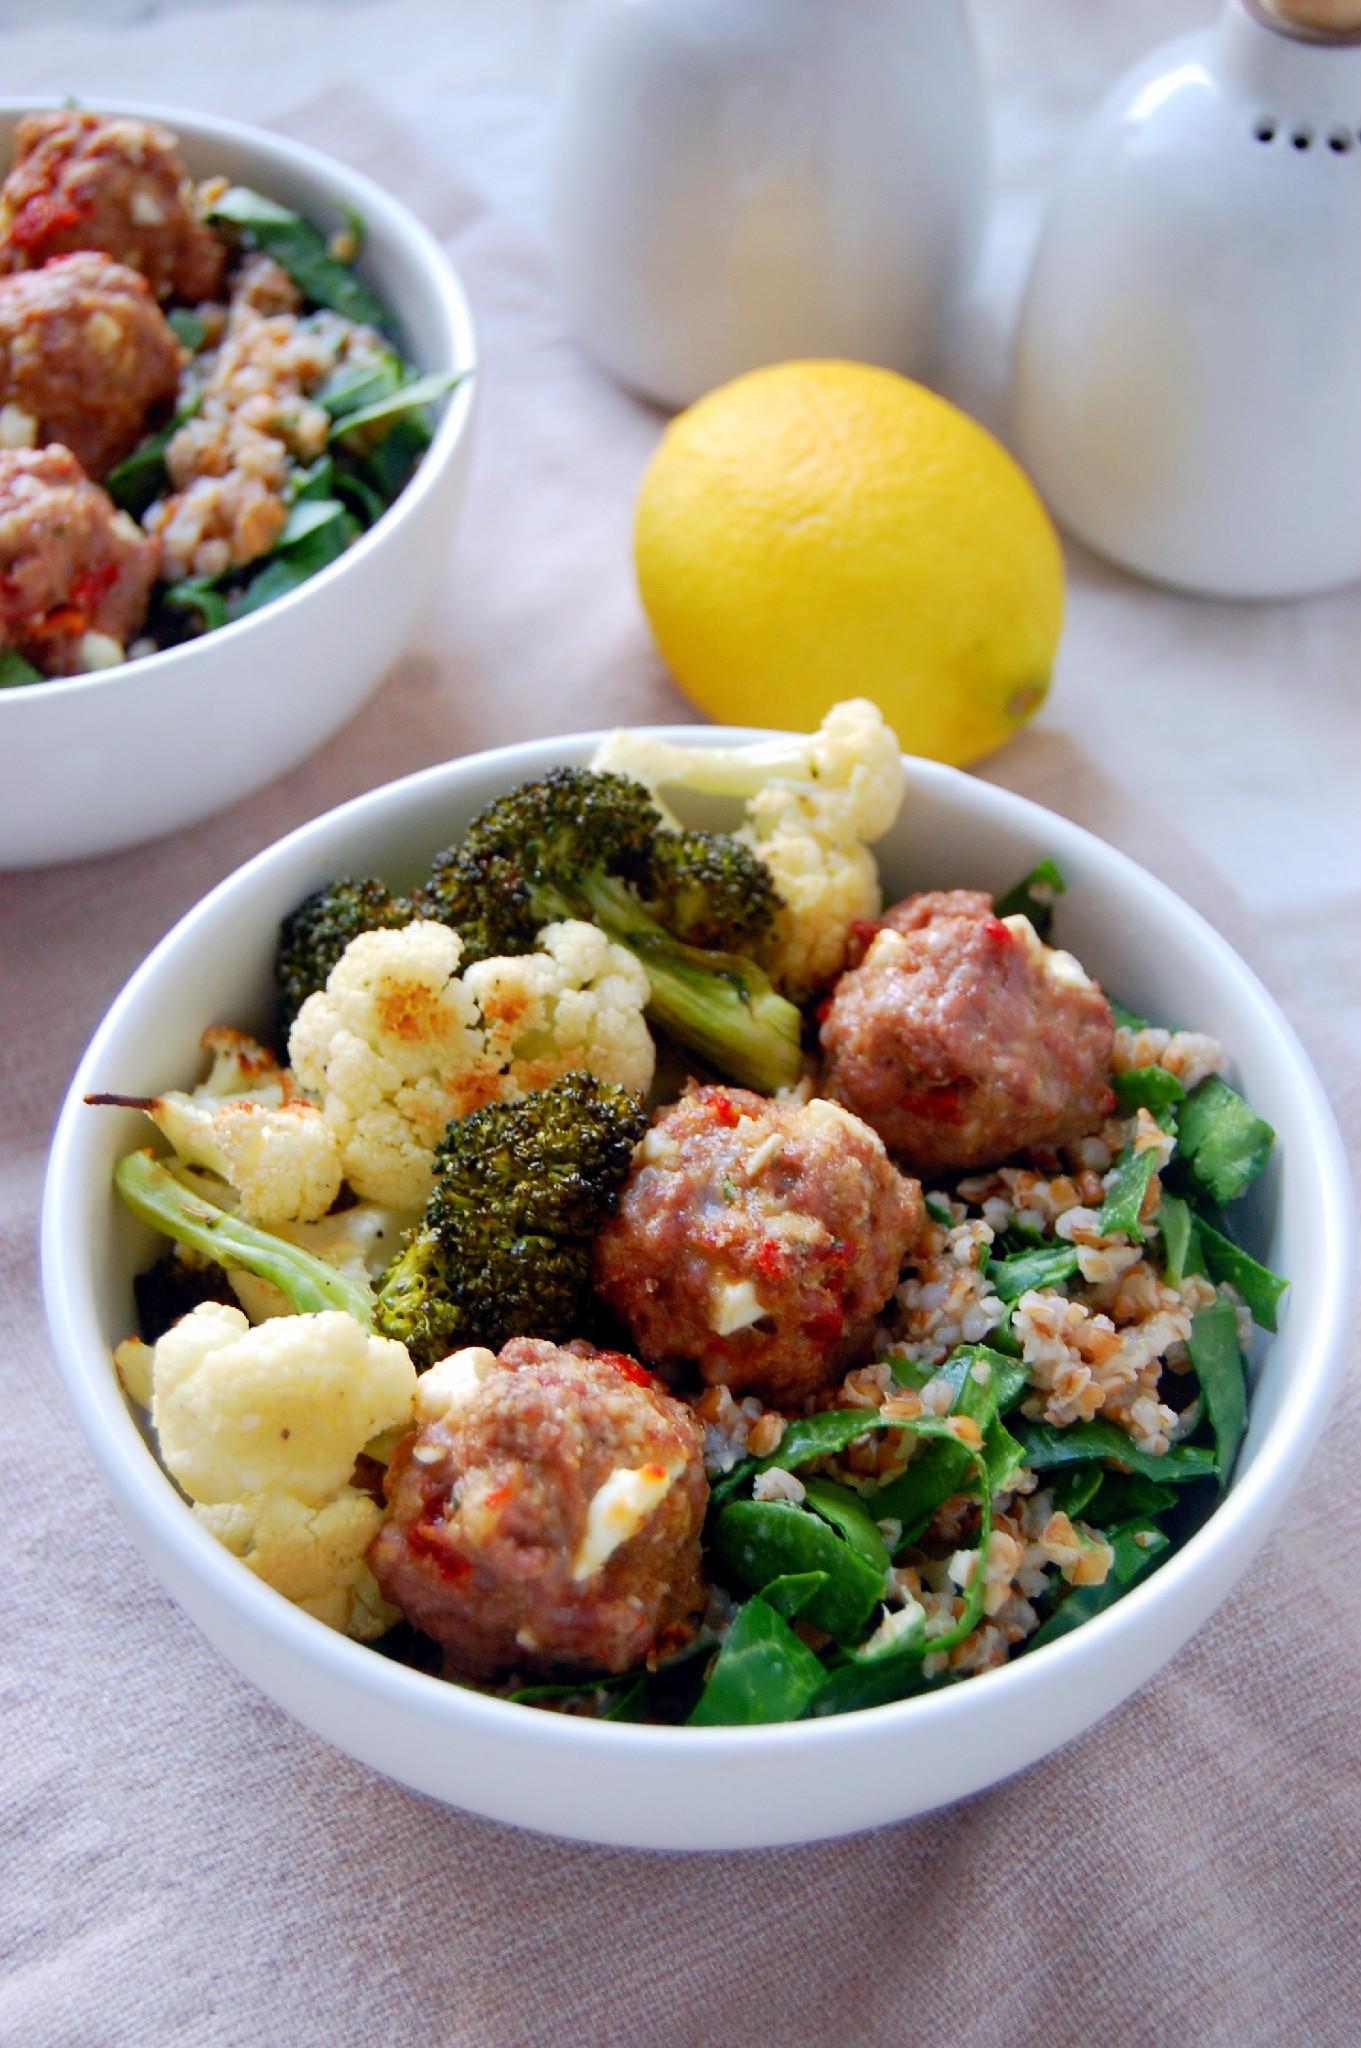 Brocoli And Cauliflower Recipes Steamed